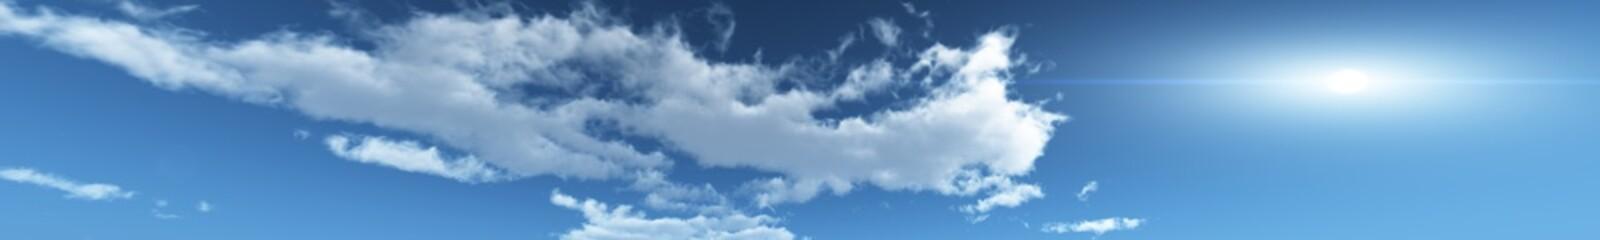 panorama sky skyline, clouds, sun in the clouds